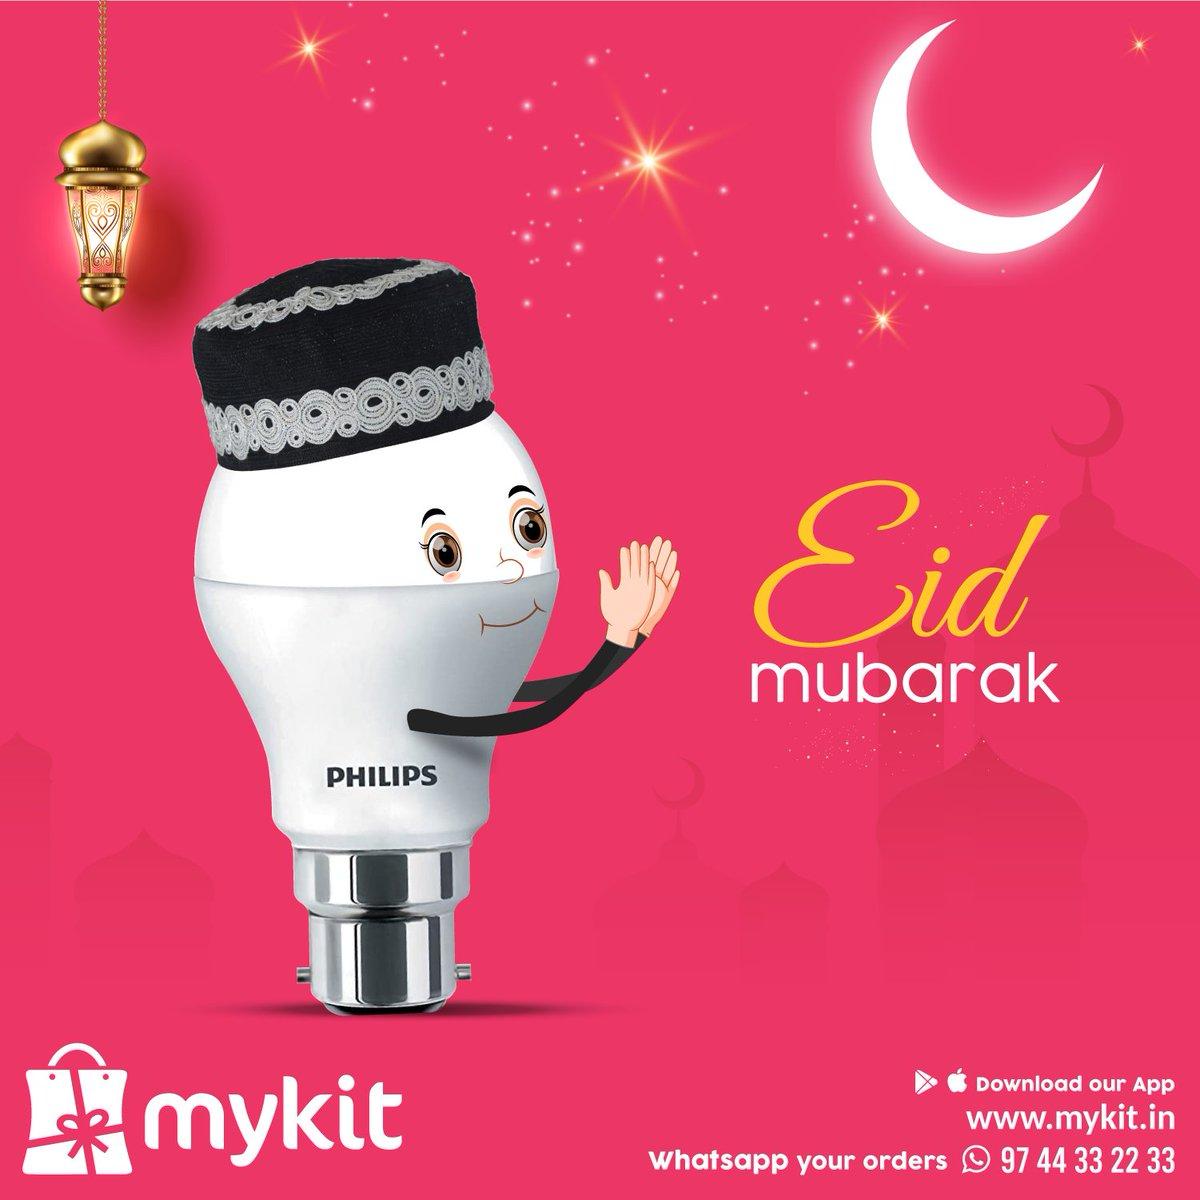 Eid Mubarak  #mykitcart #mykit  #happyeid #eidmubarak #eid #stayhome #staysafe #kannur #kerala #onlineshopping https://t.co/tW8Wb7PgWv